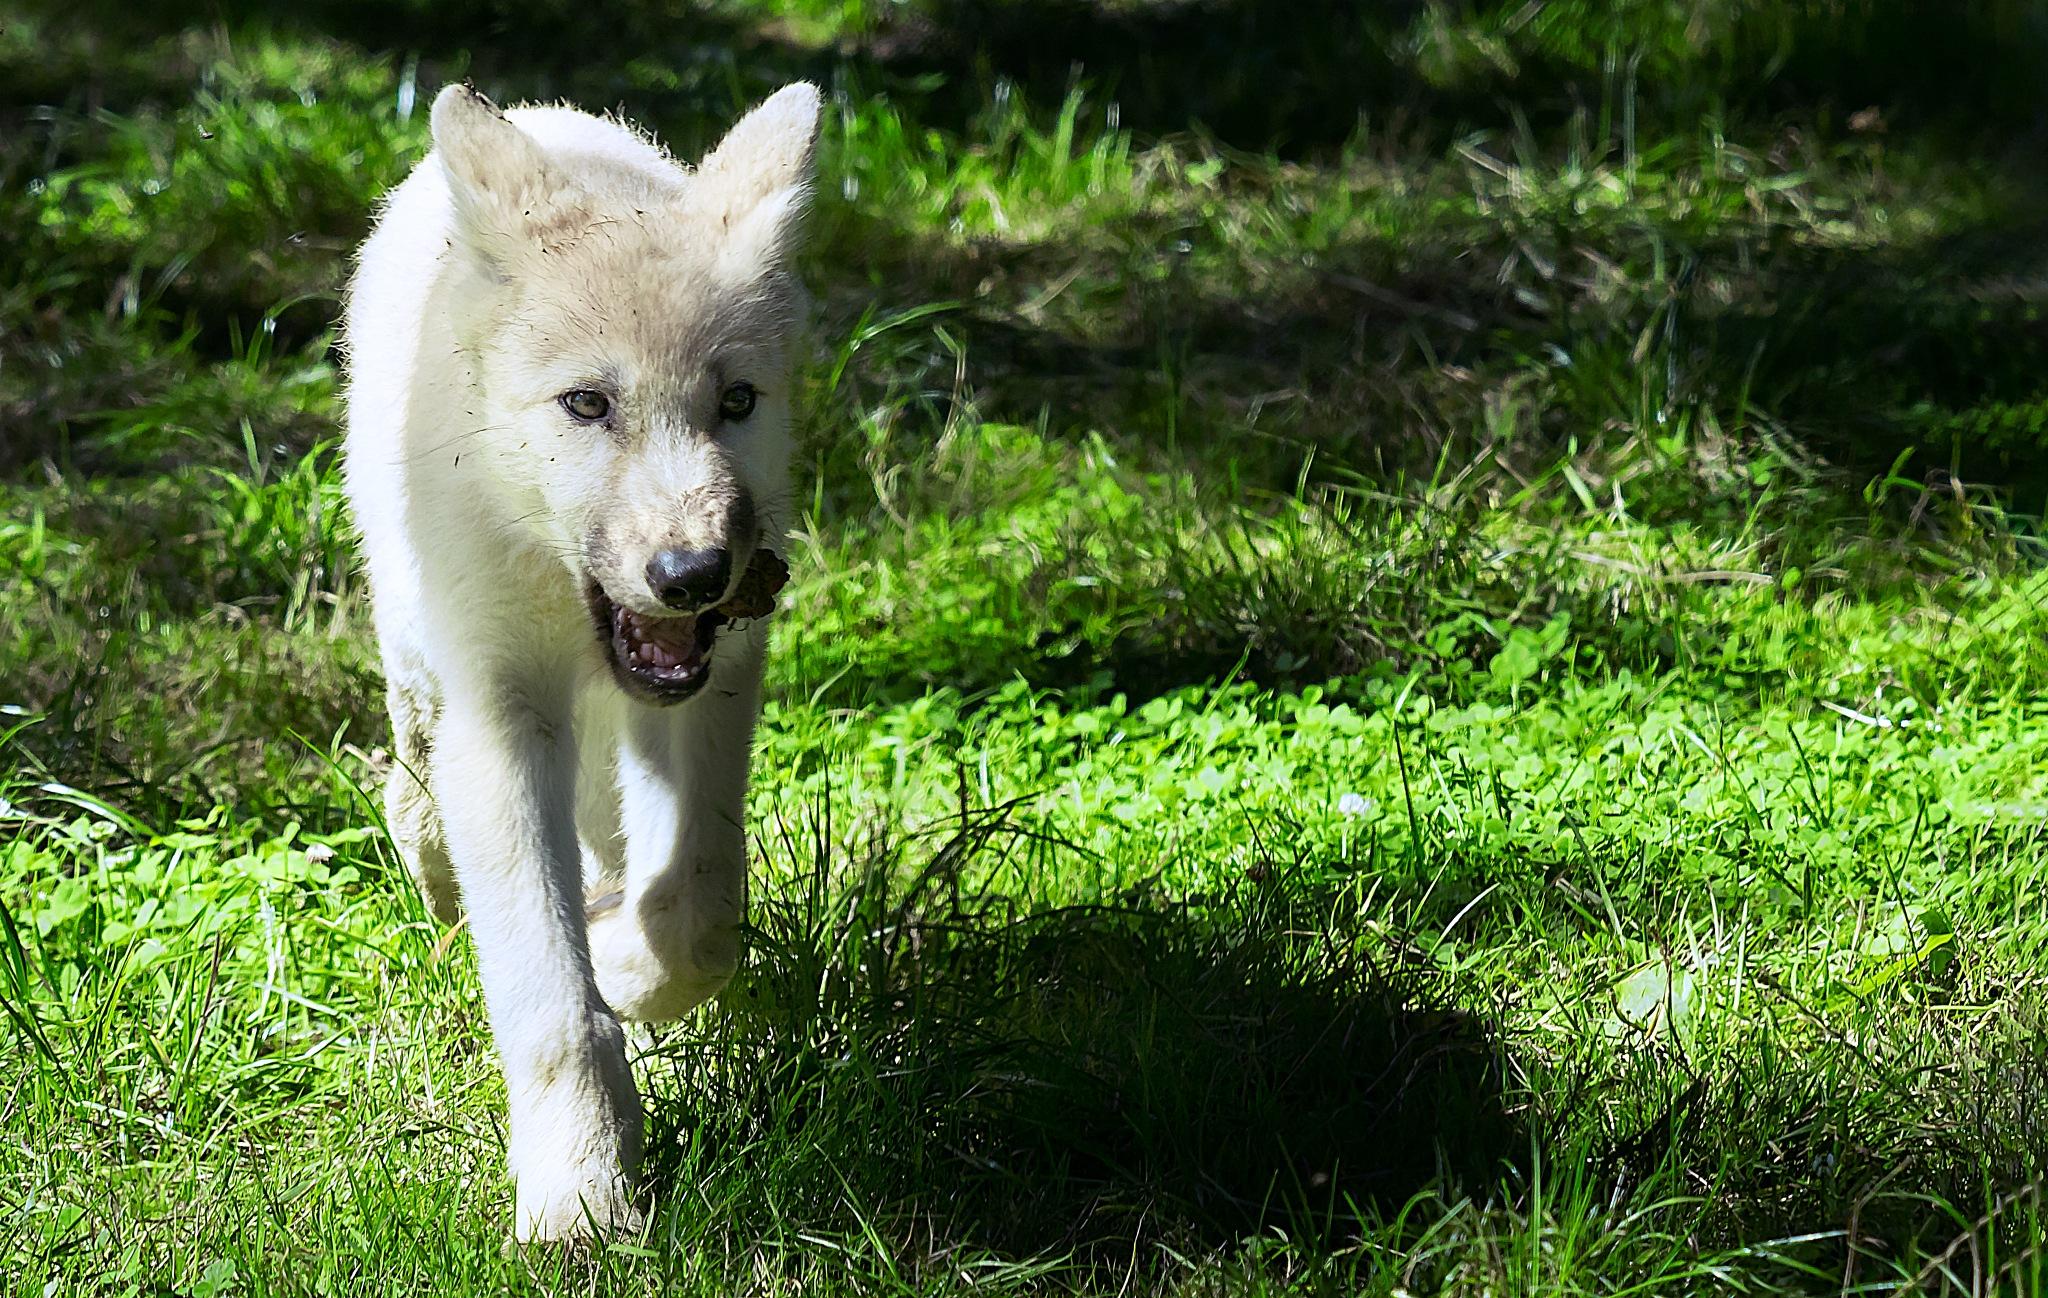 White wolf pup by Michael B. Rasmussen